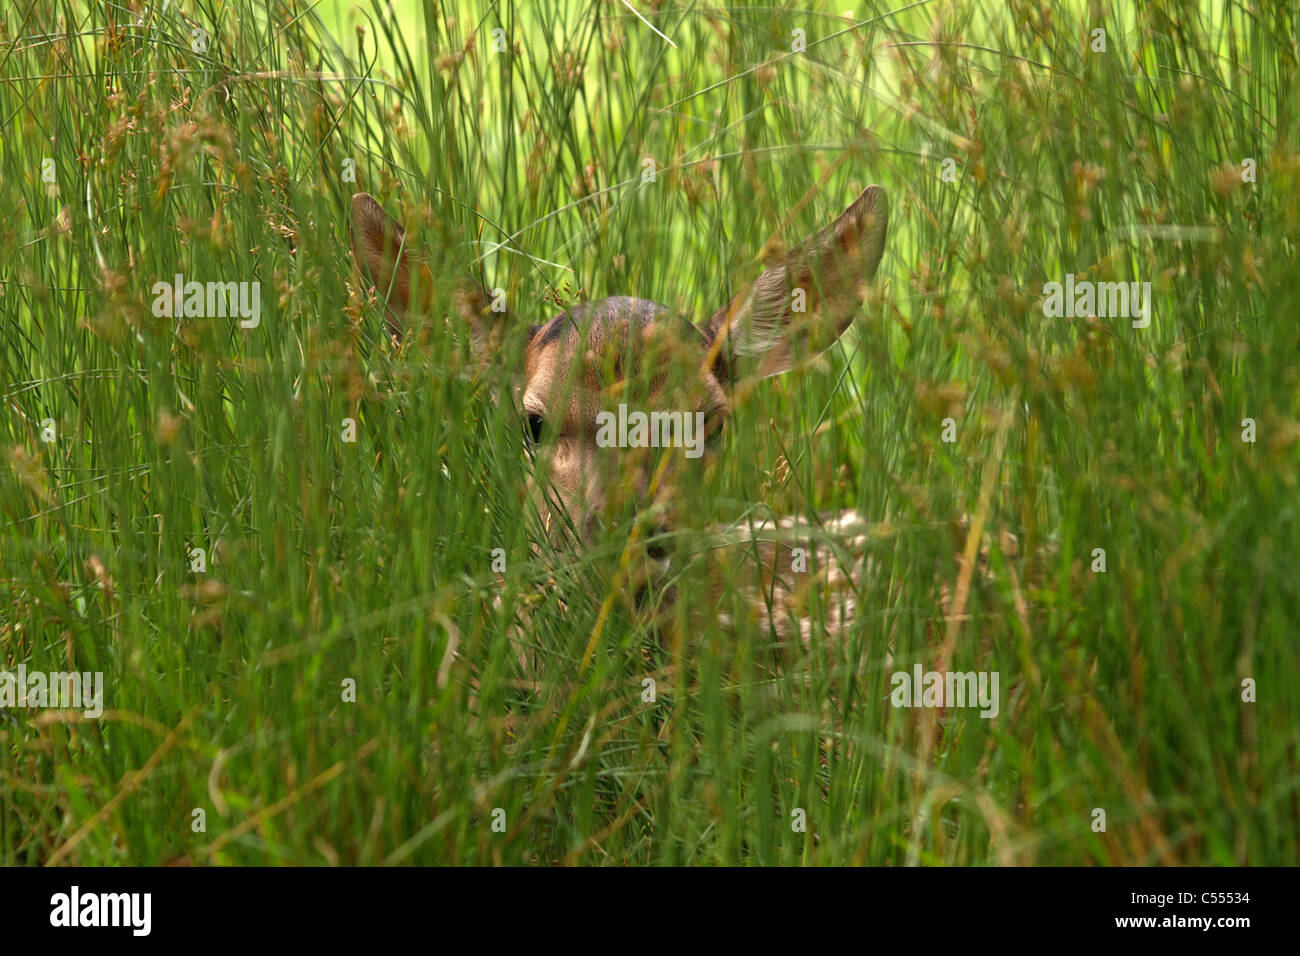 Young Red Deer (Cervus Elaphus) verstecken sich in der Wiese Stockbild